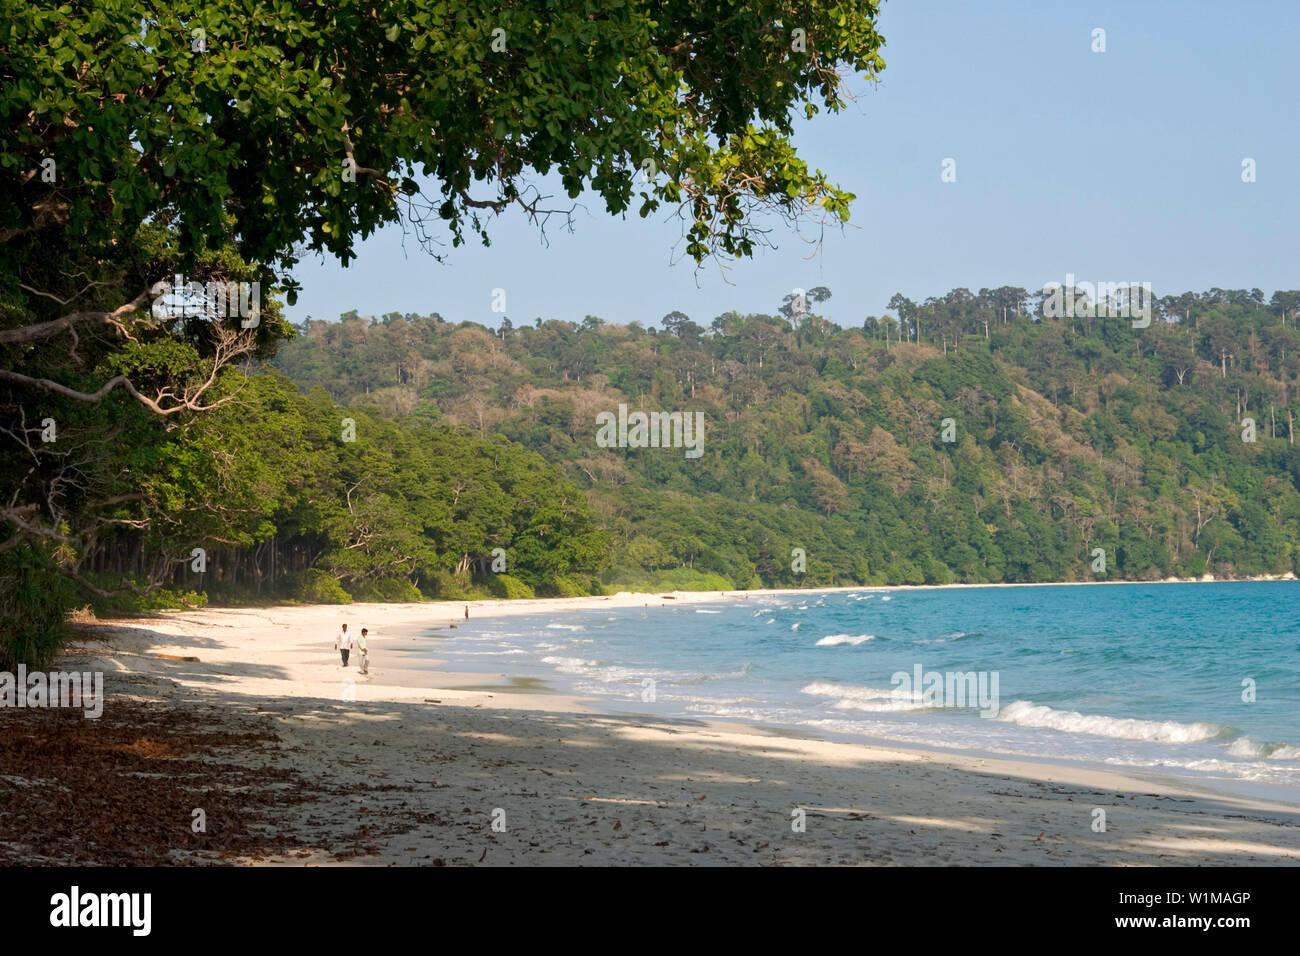 Coastal rainforest, Havelock Island, Andaman Sea, Kuesten-Regenwald, Strand, Bucht, Havelock, Andamanen, IndienCoastal Rainforest, beach, Andaman Isla - Stock Image